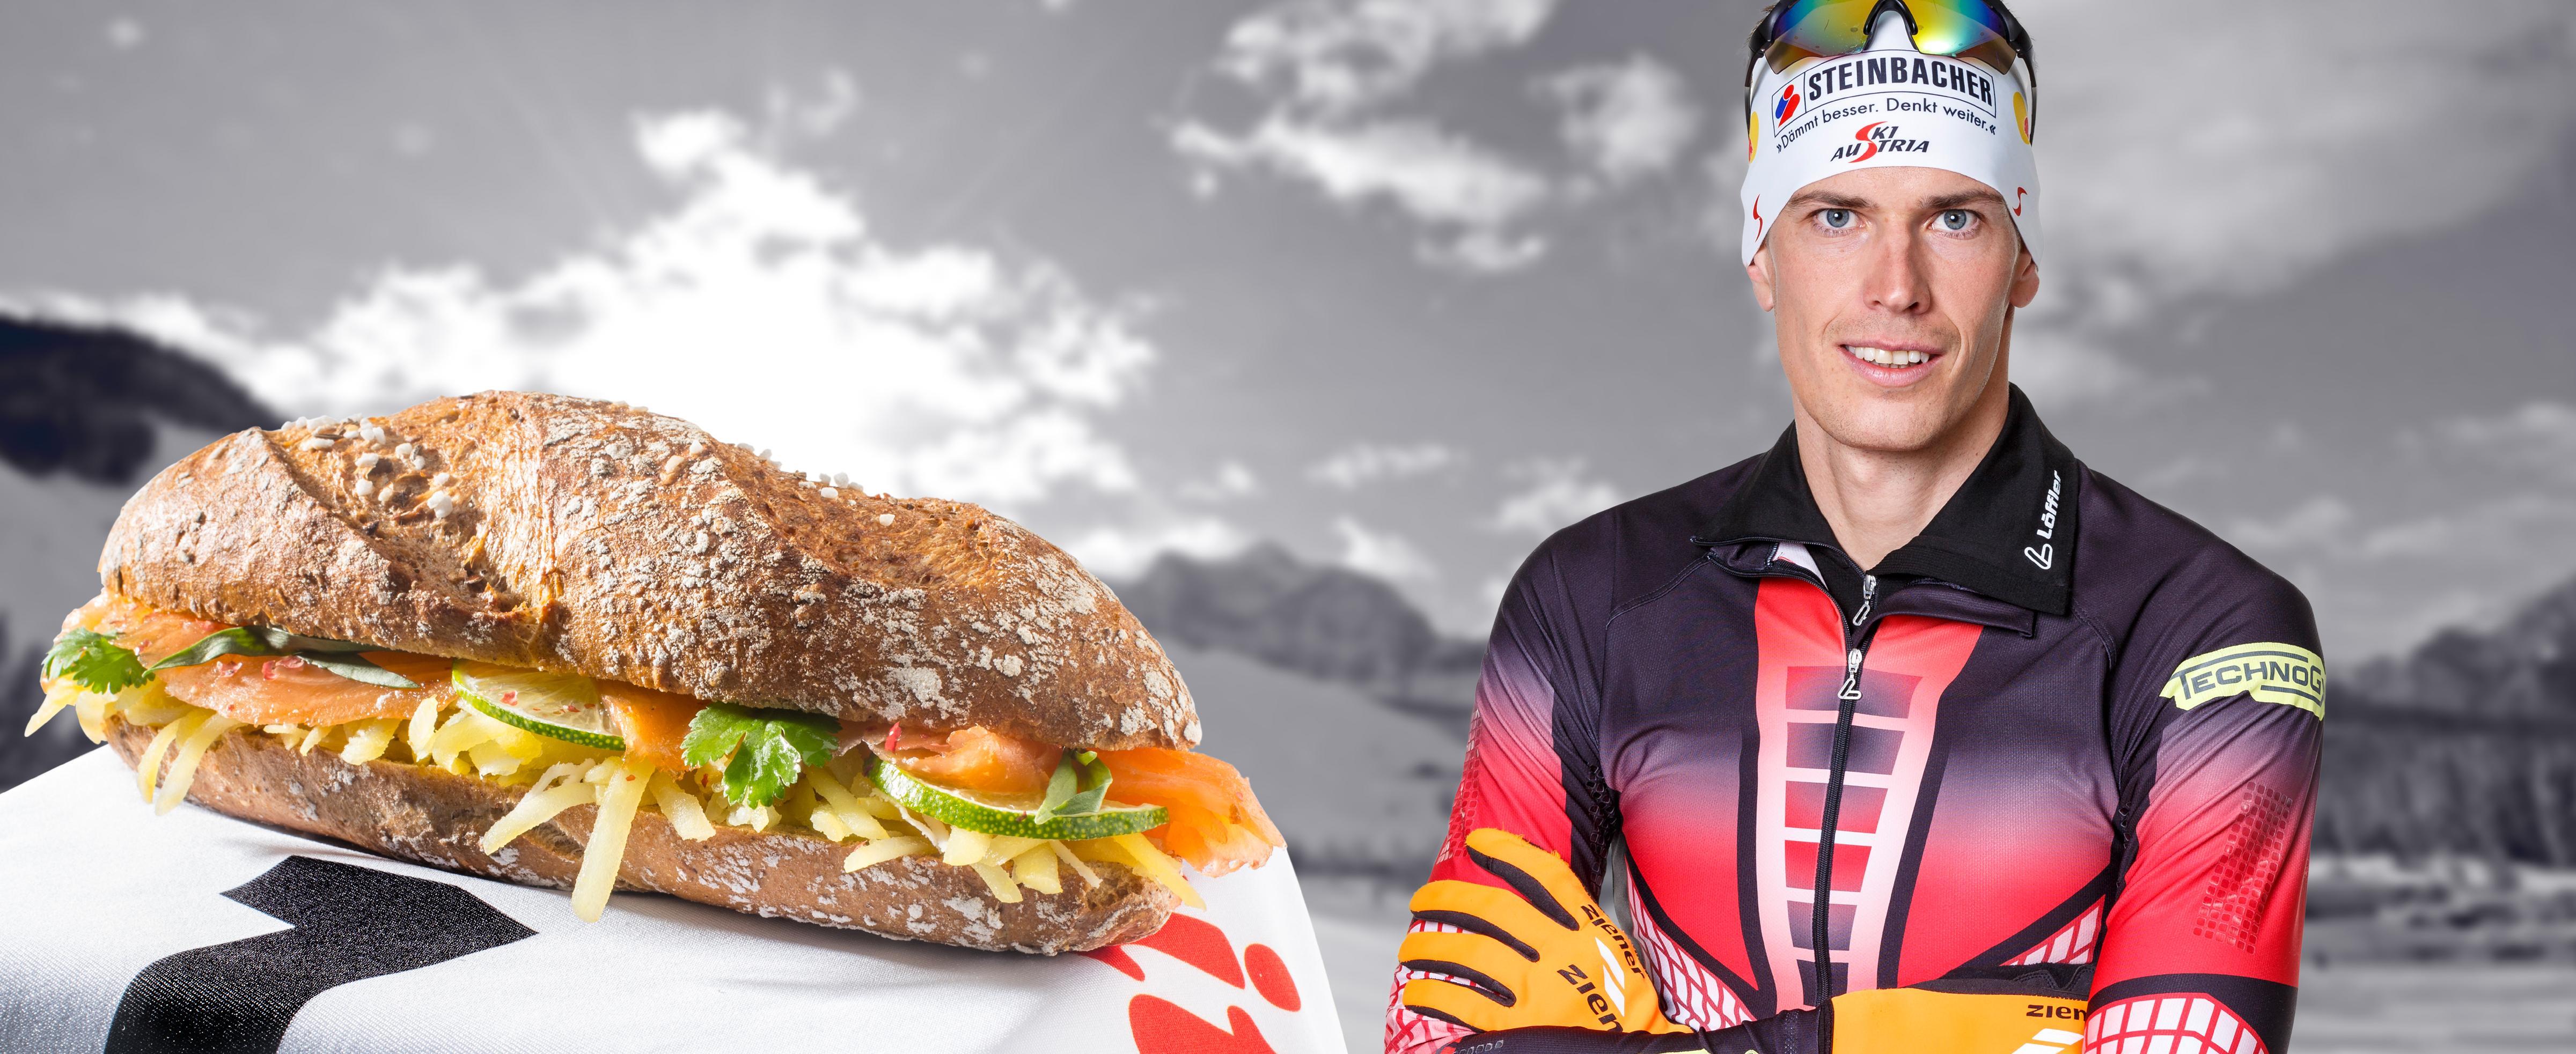 backaldrin, Julian Eberhard, Kornspitz - Sportteam